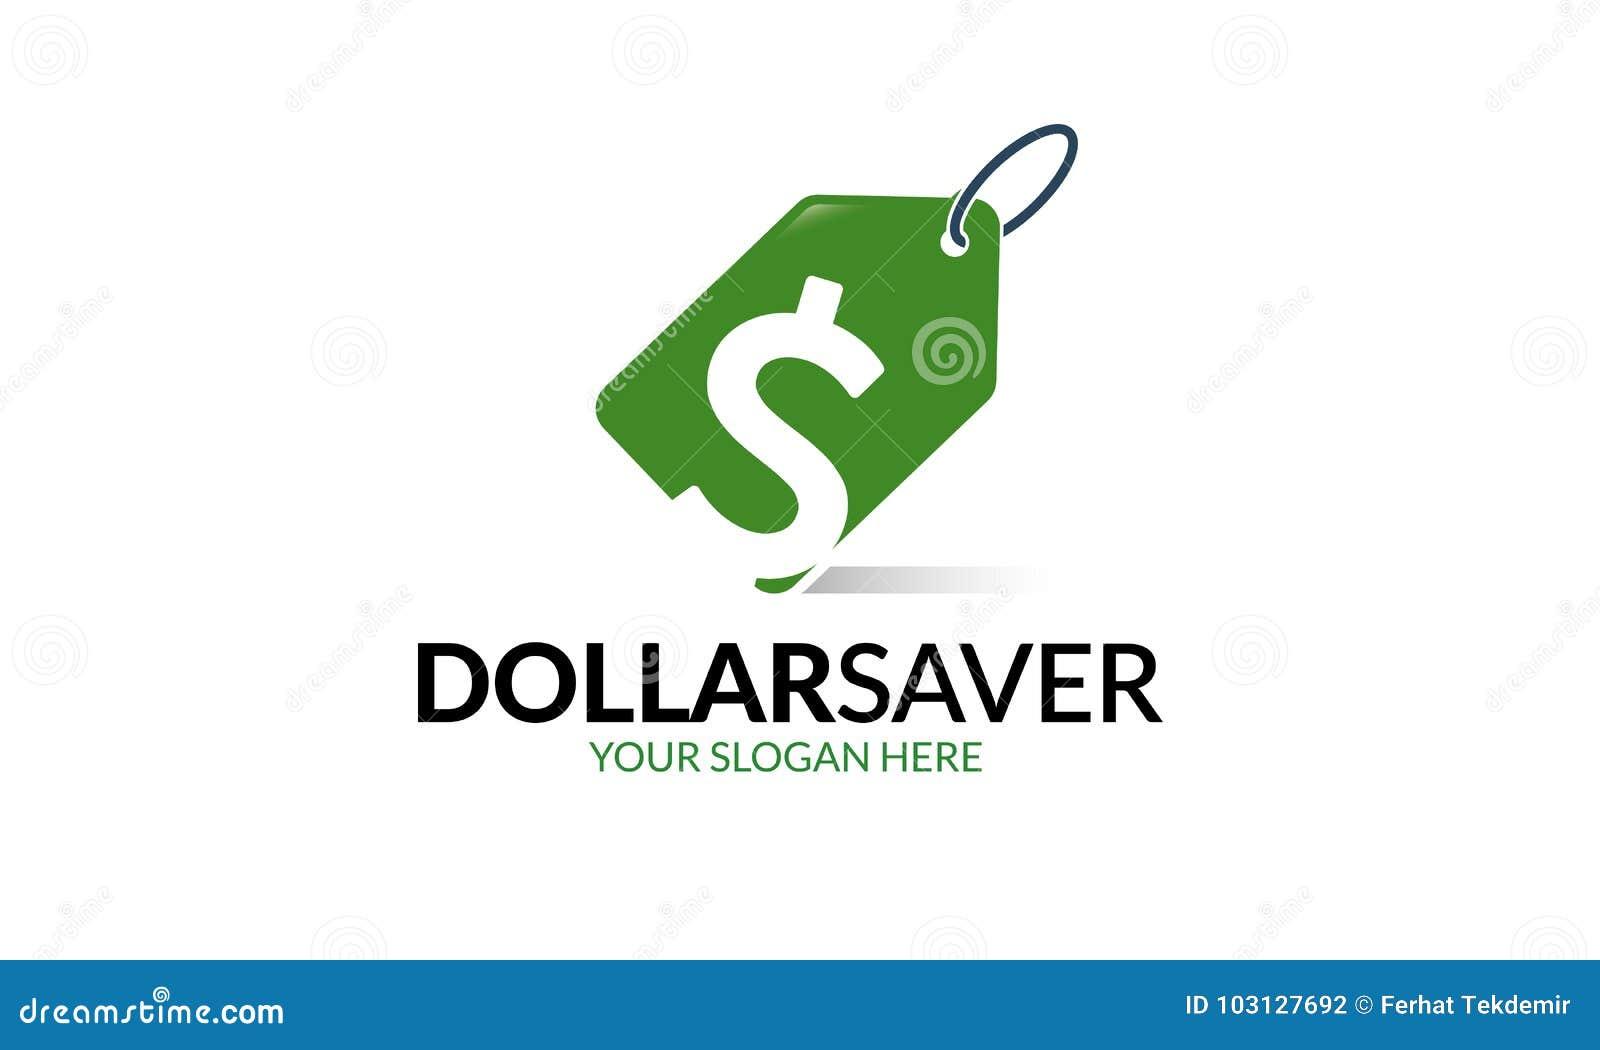 purchase logo template  Dollar saver logo template stock illustration. Illustration of ...